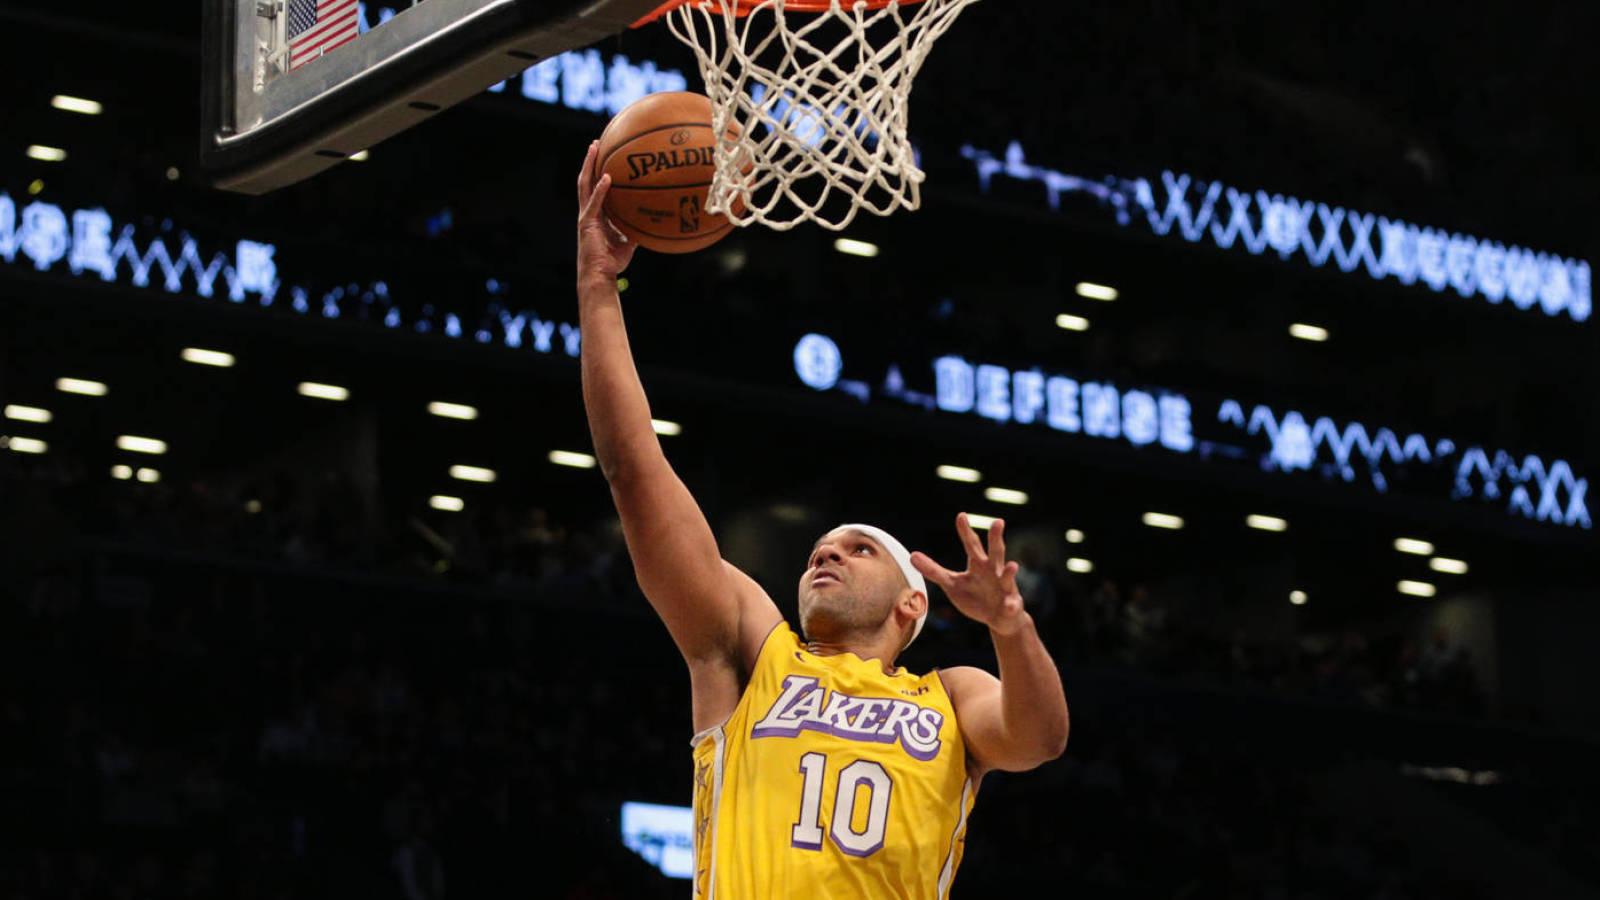 Cancel NBA season - Shaq | Tempo - The Nation's